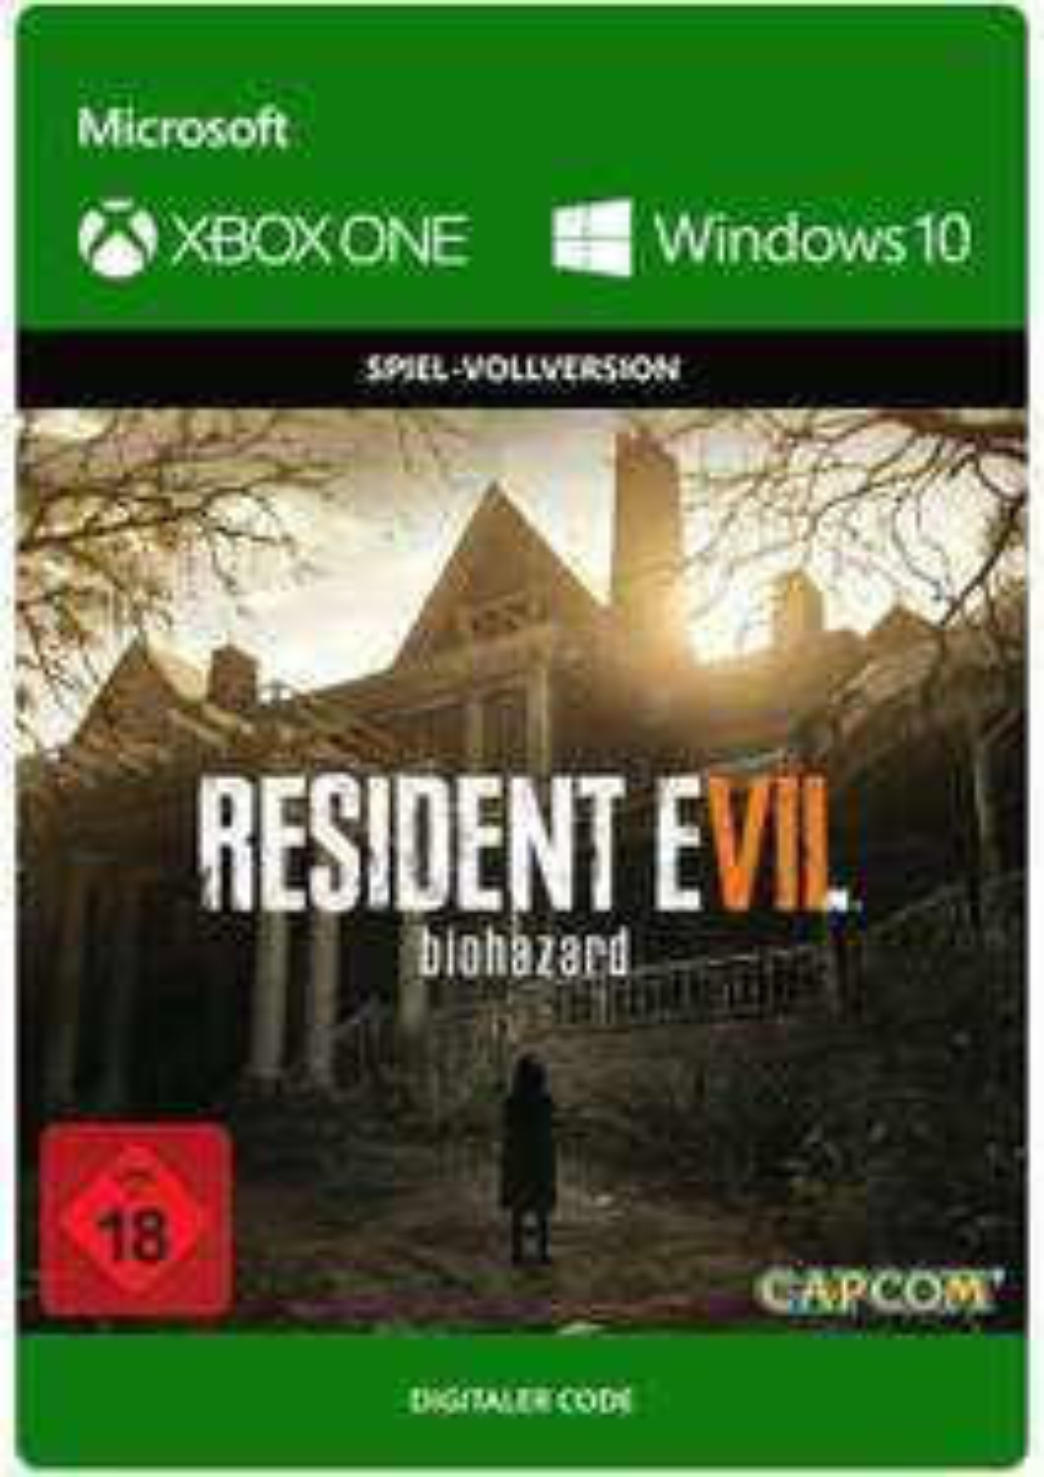 Resident Evil 7: Biohazard (Xbox One/Windows 10 - Digital Code) für 9.99€ (Xbox Store)